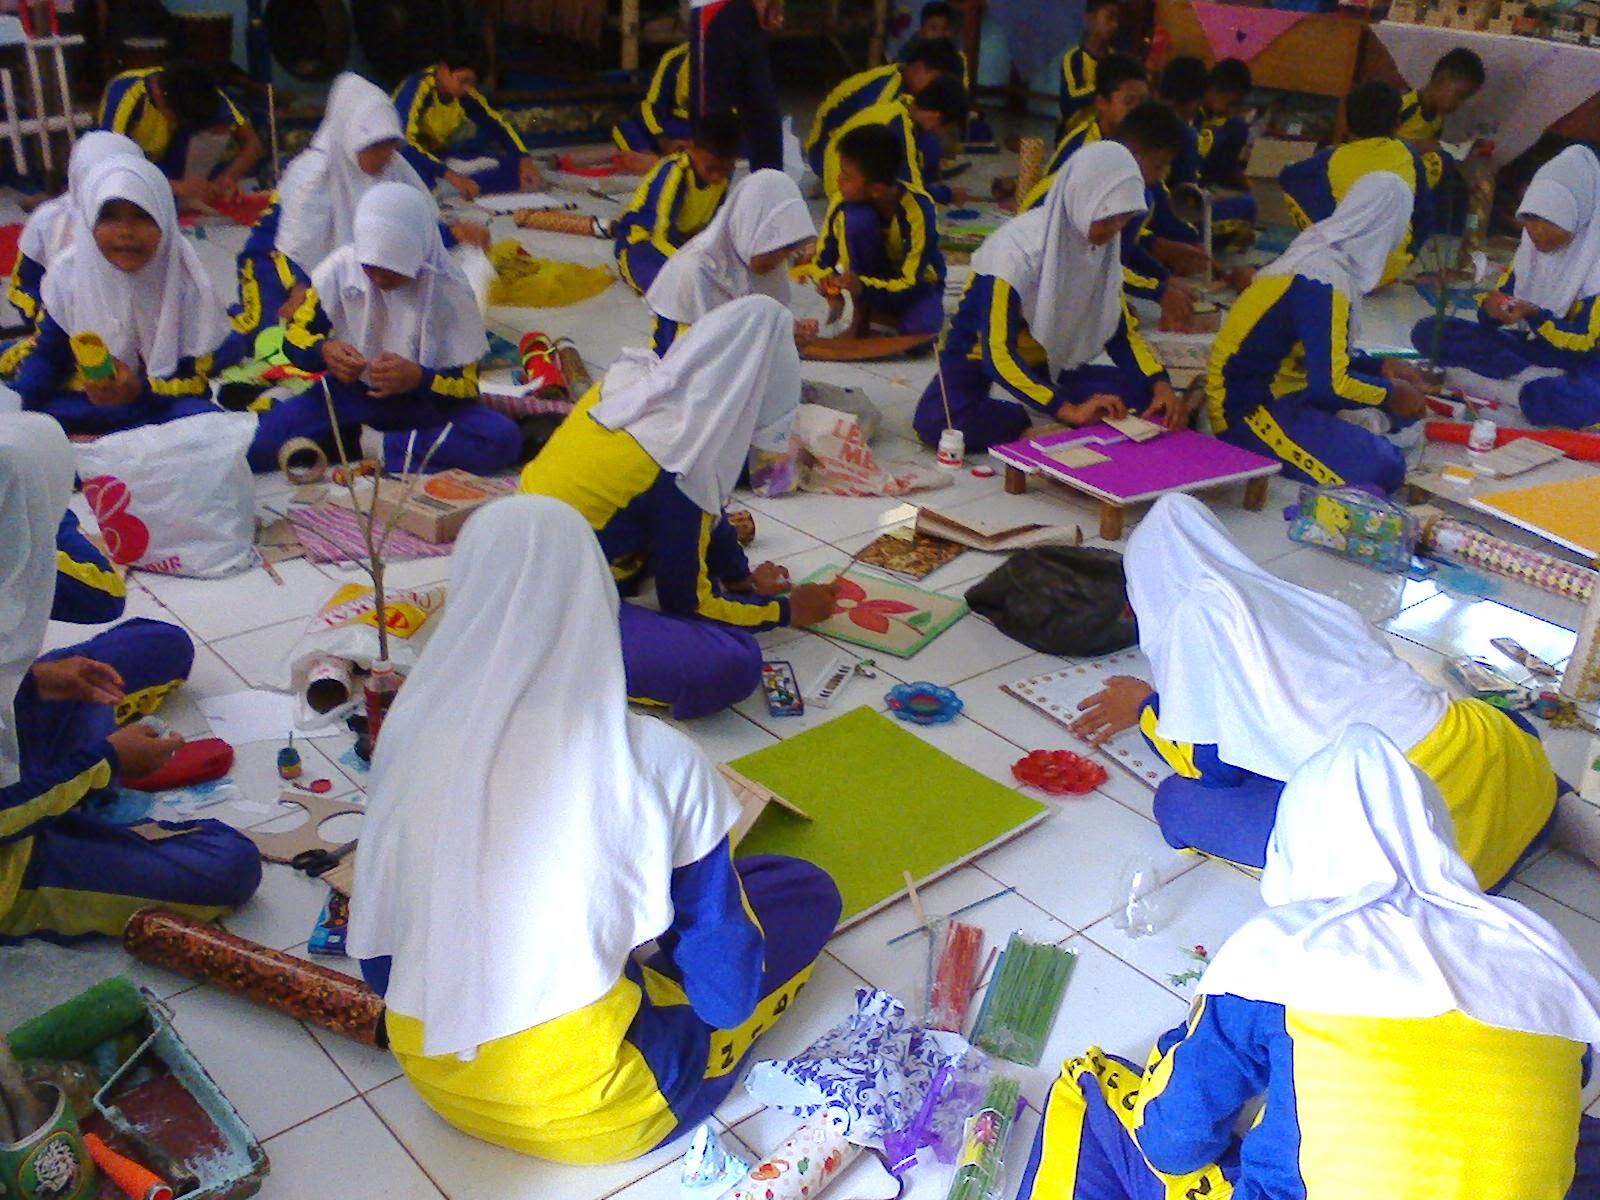 Pada tahun pelajaran 2014 2015 semua Sekolah Menengah Pertama SMP di seluruh Indonesia akan melaksanakan Kurikulum 2013 pada kelas VII dan VIII